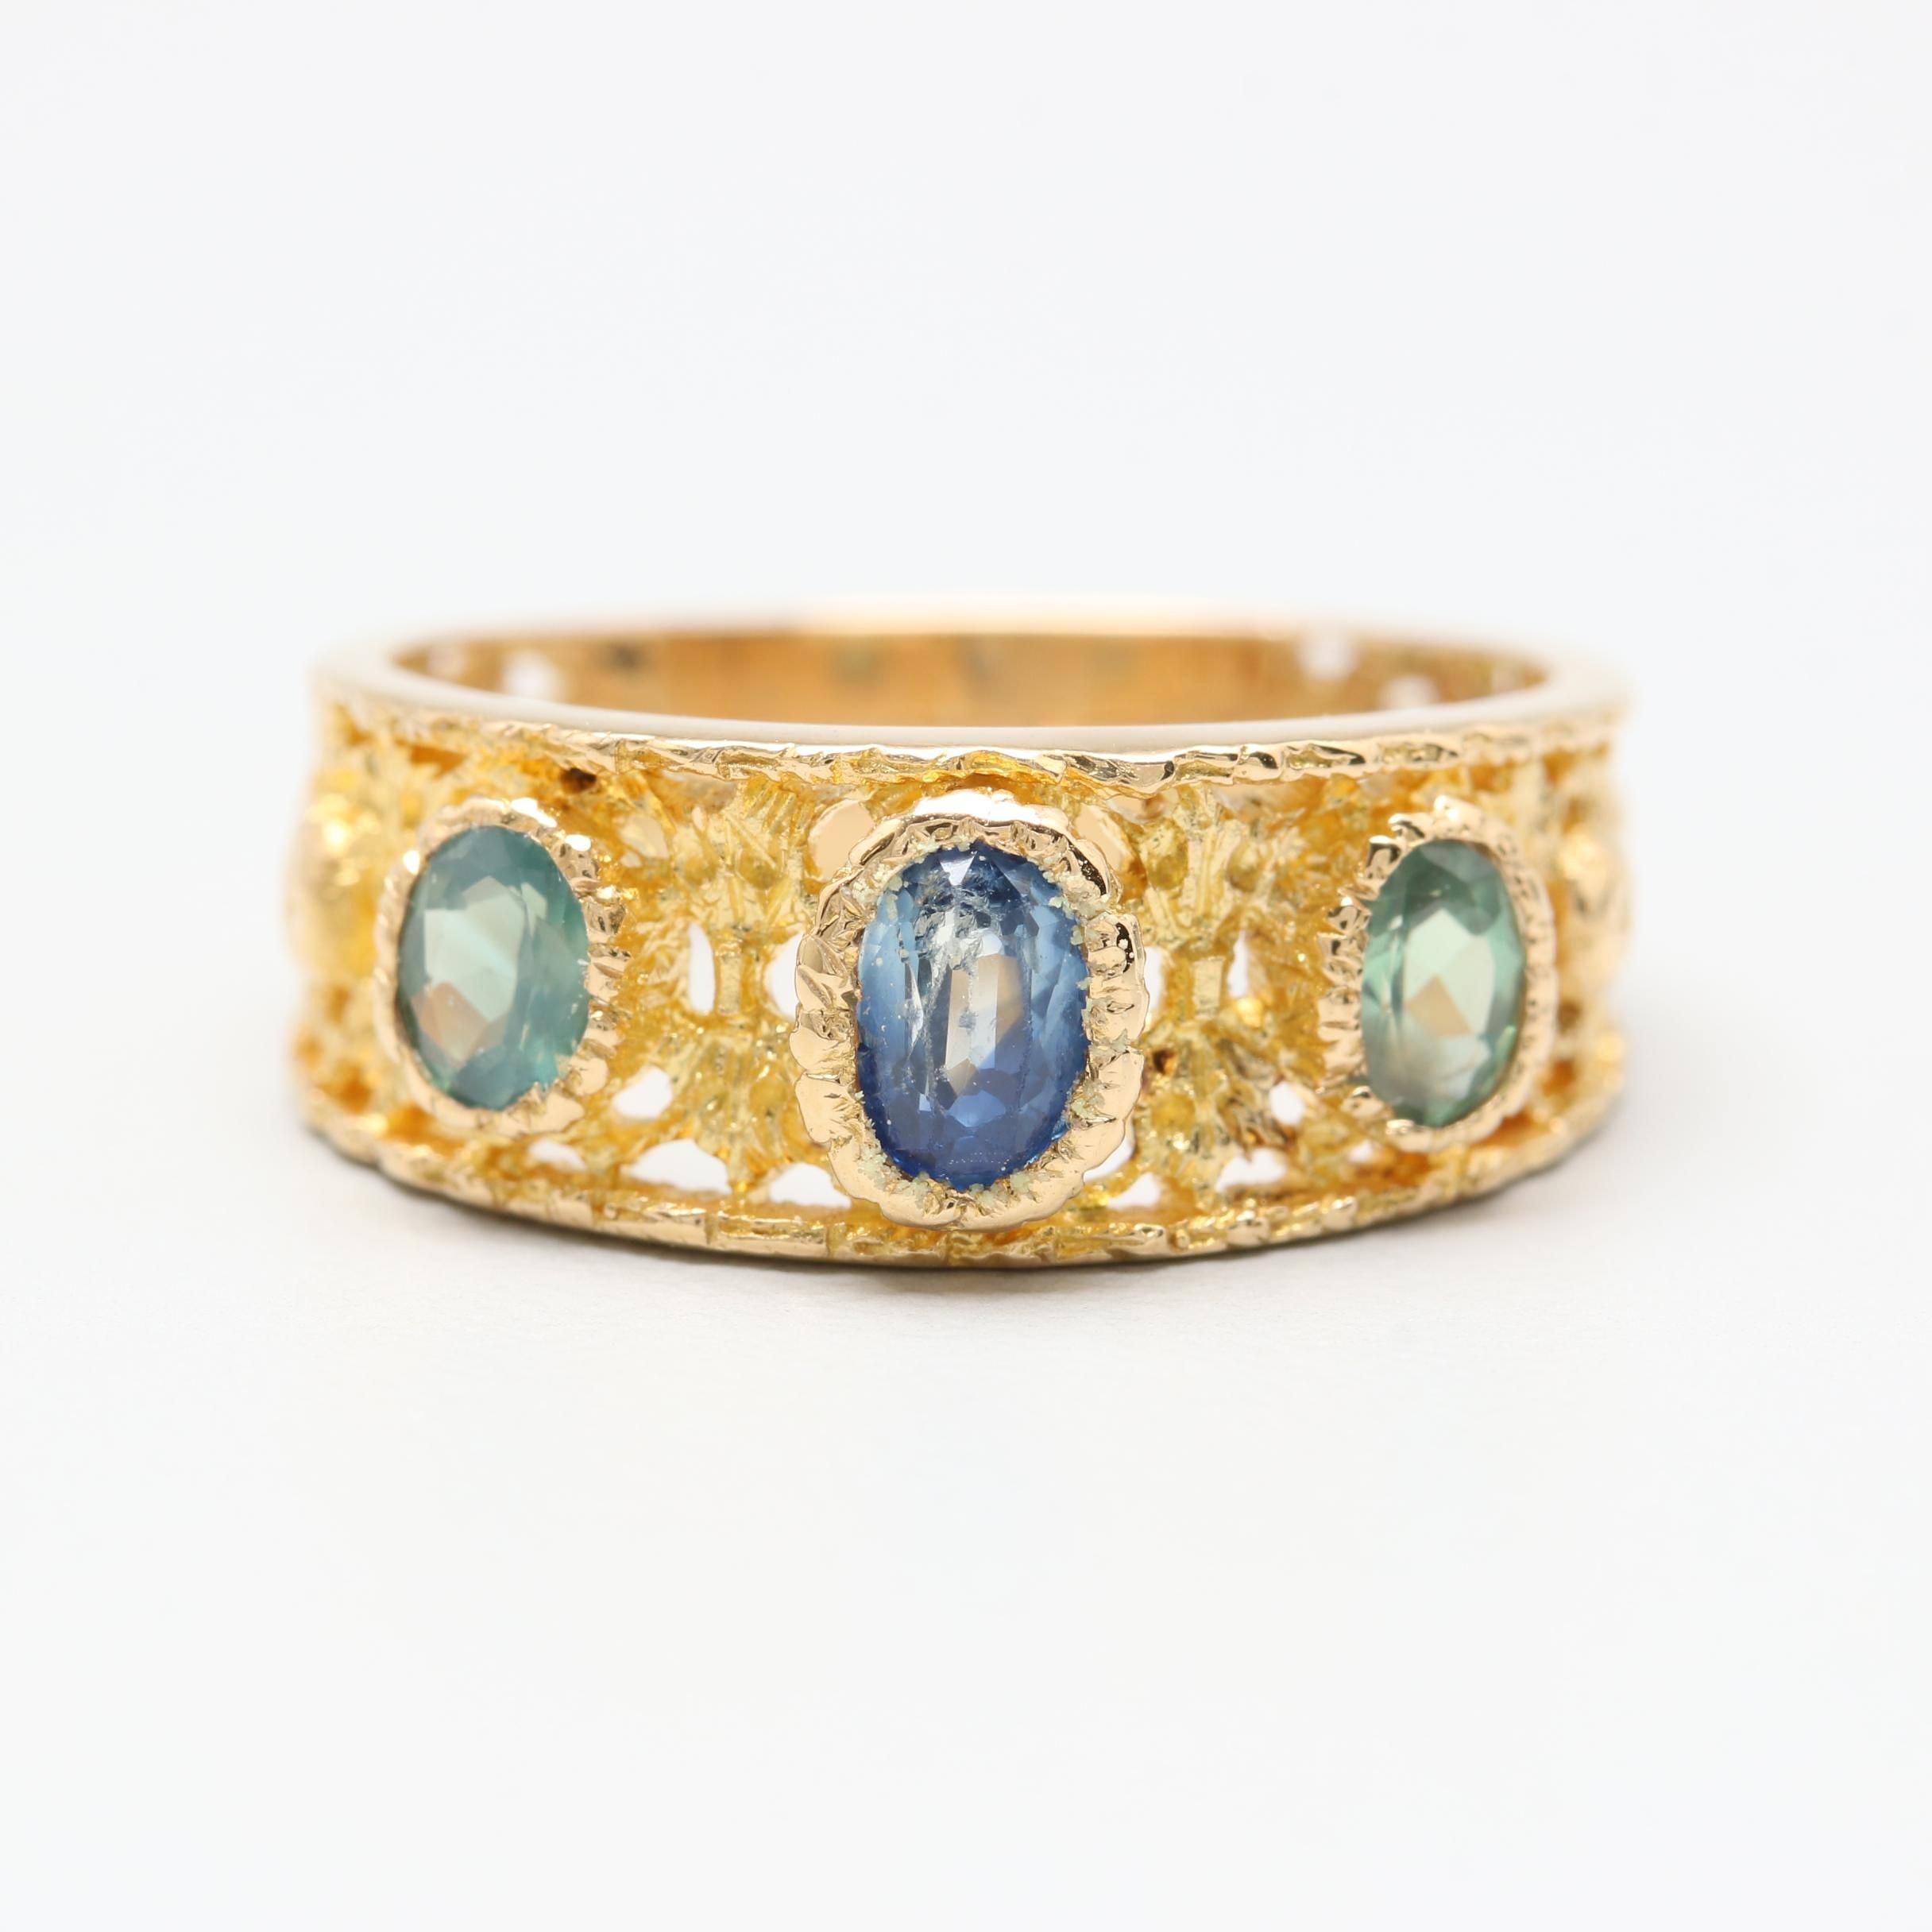 18K Yellow Gold Sapphire and Alexandrite Ring